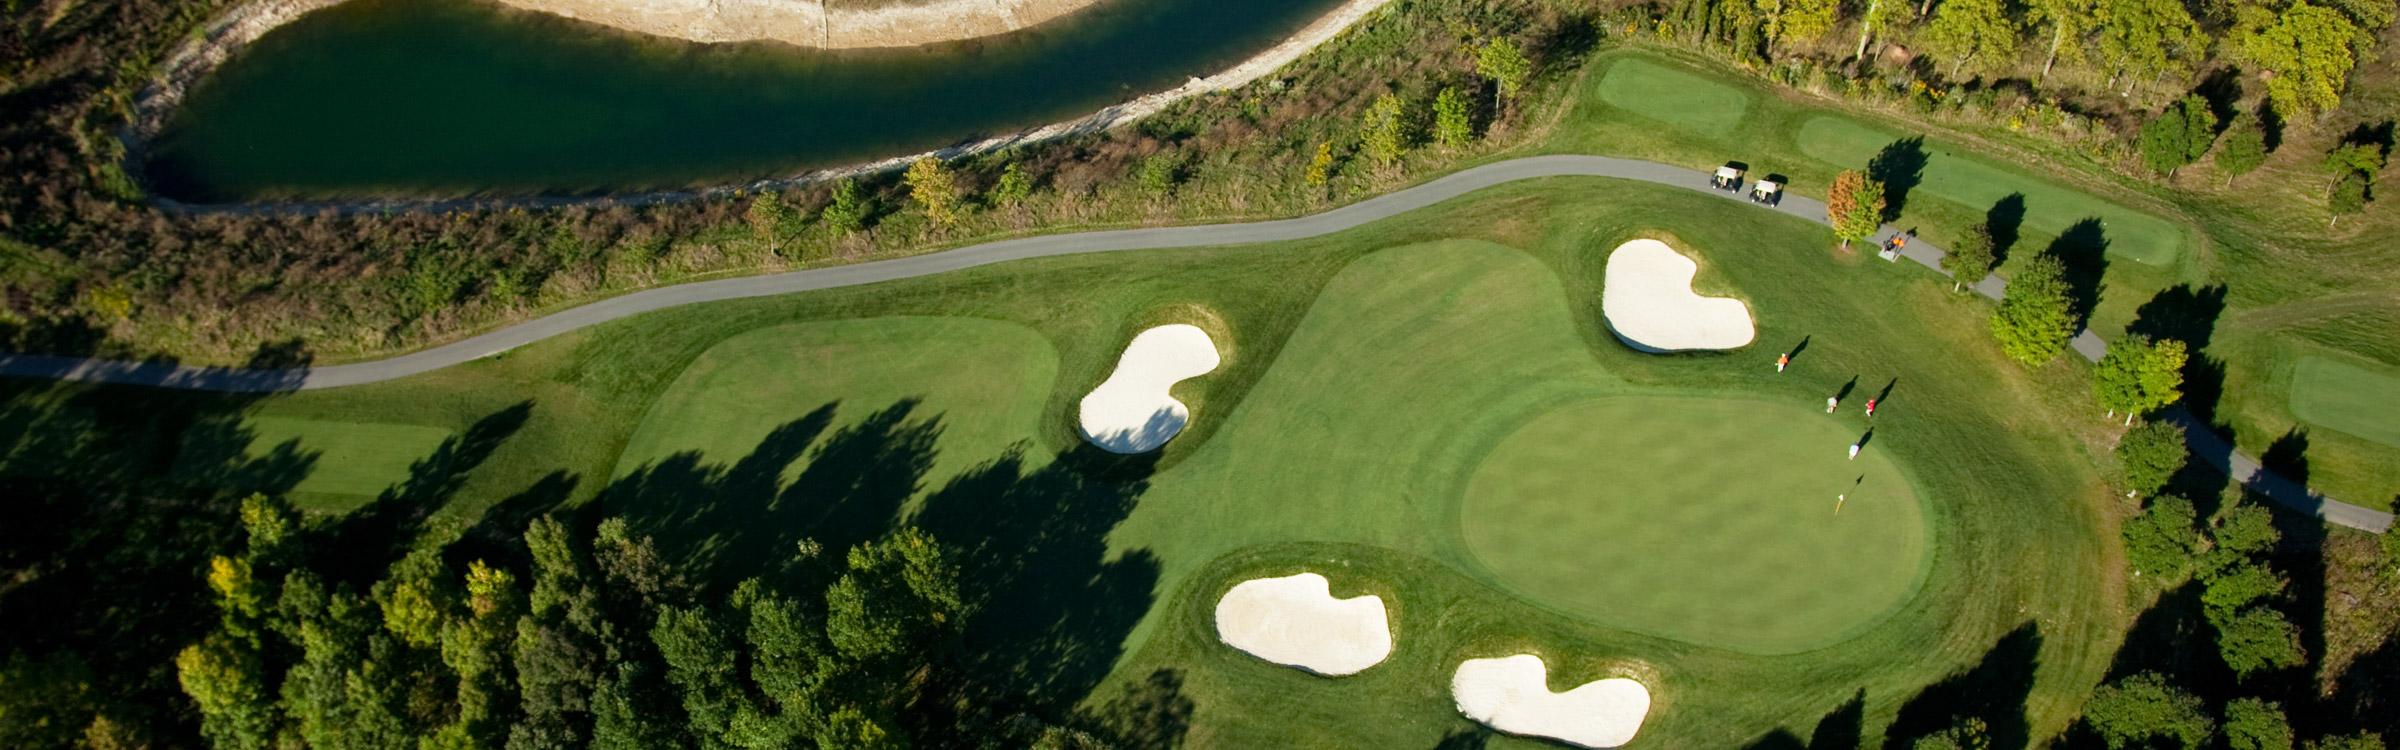 Dragon's Fire Golf Club